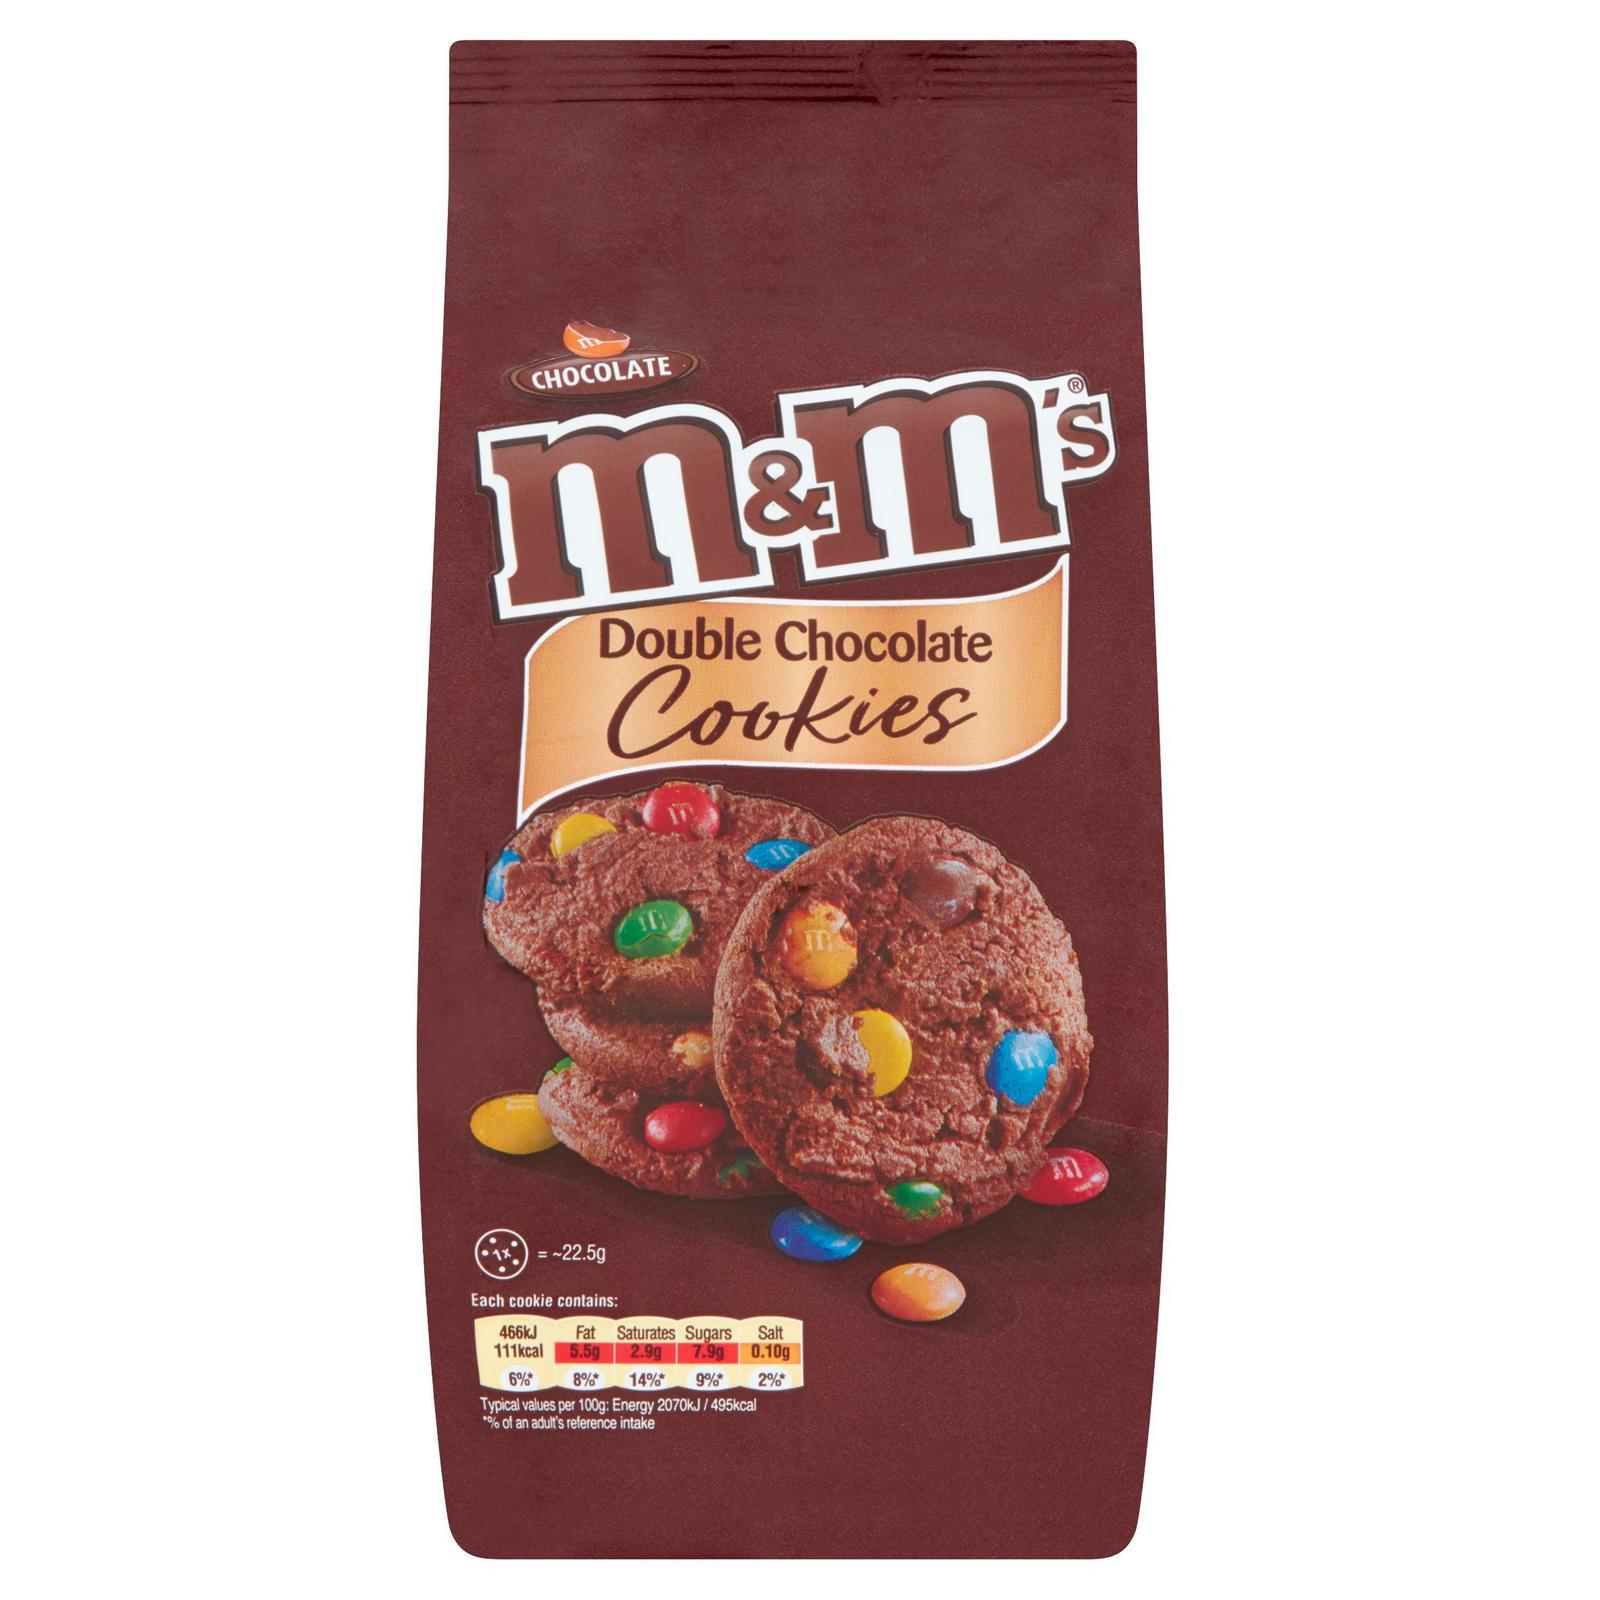 M&M's Double Choc / Galaxy White Choc Chunk / Galaxy Choc Chunk Cookies , 2 Pks For £2.50 ( OR £1.49 Each ) @ Iceland